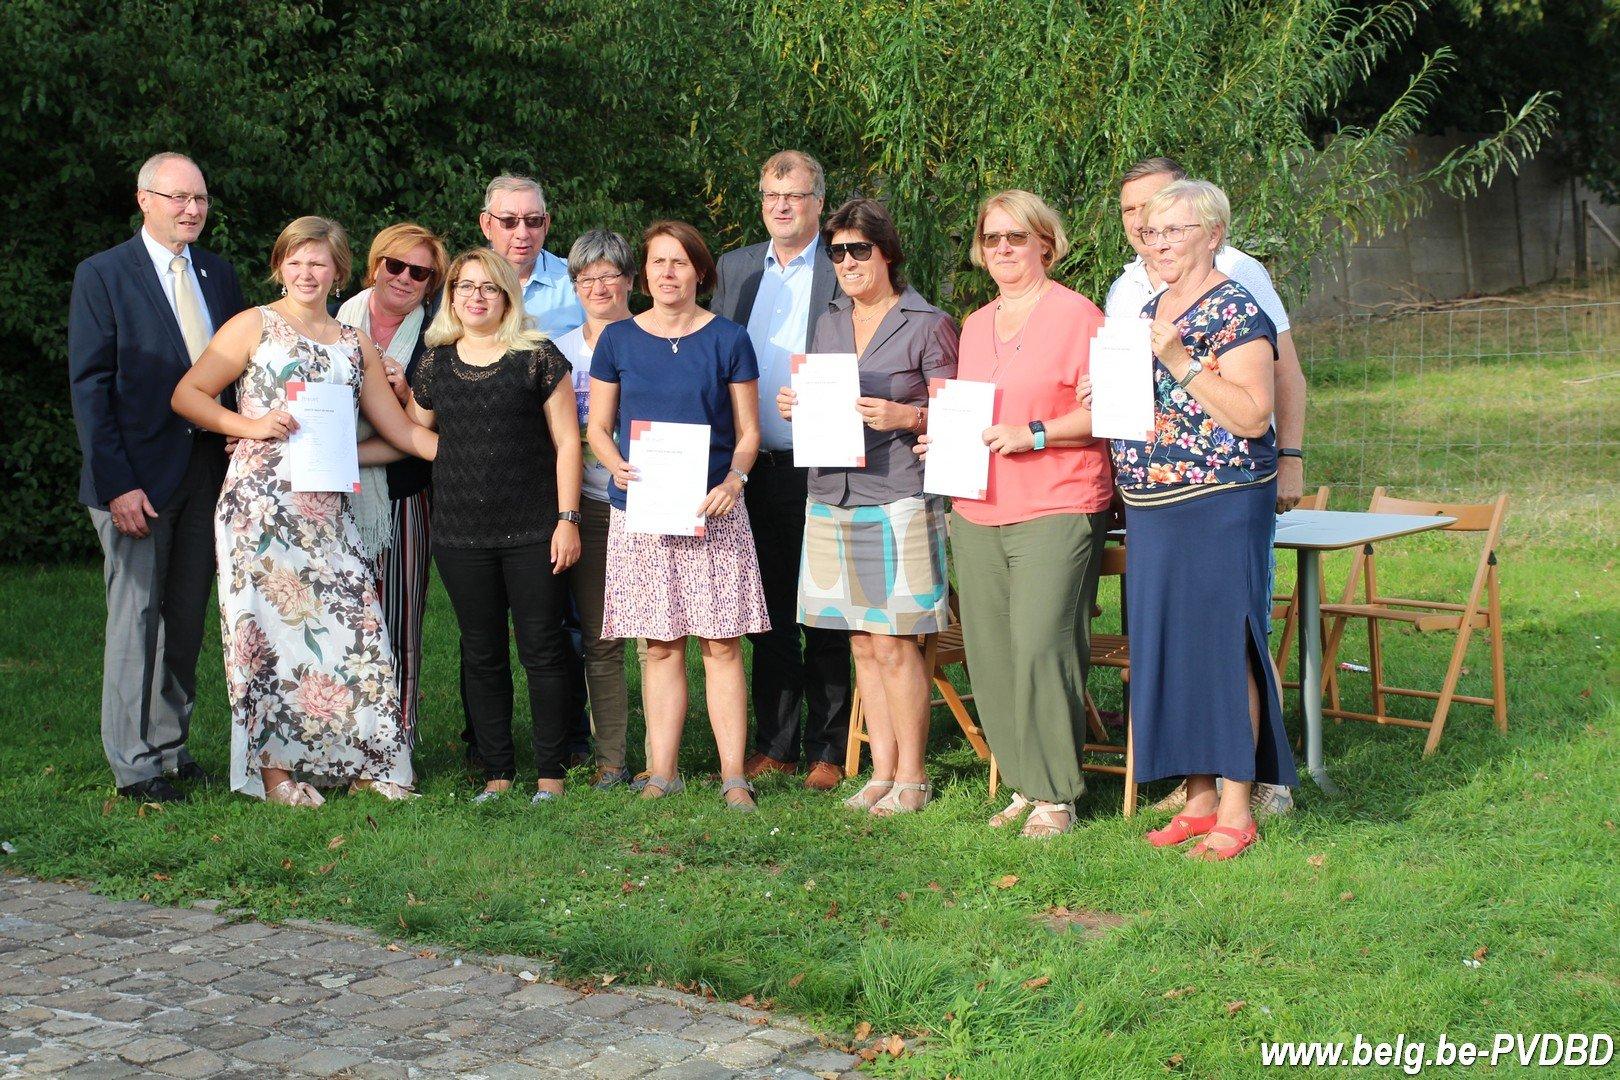 Uitreiking Brevetten EHBO en Dilbeek Hartveilig verklaard - IMG 1445